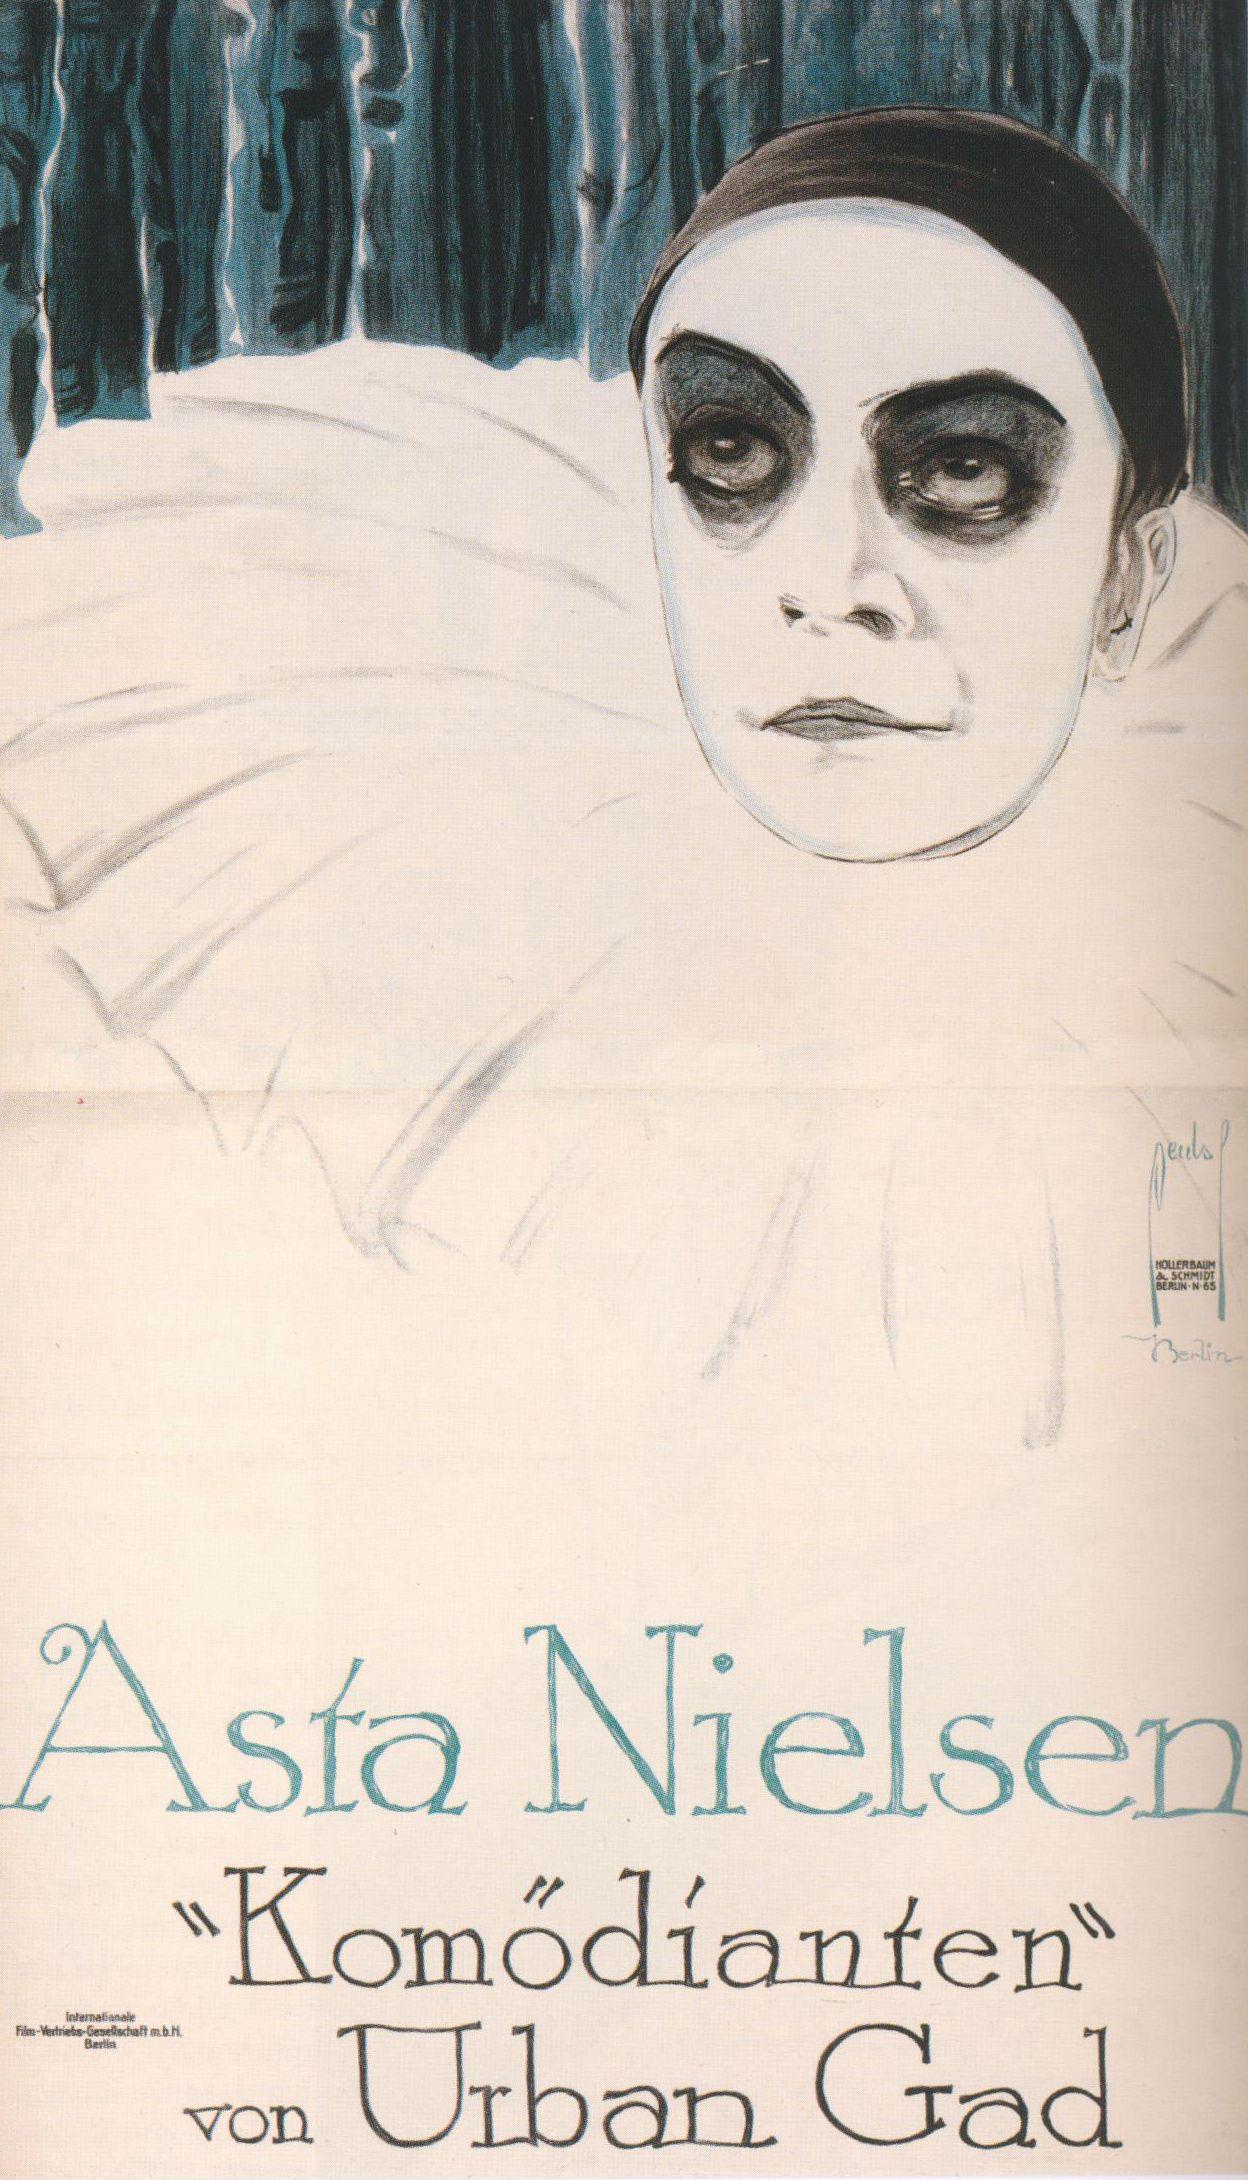 Asta Nielsen as Pierrot in Urban Gad's Behind Comedy's